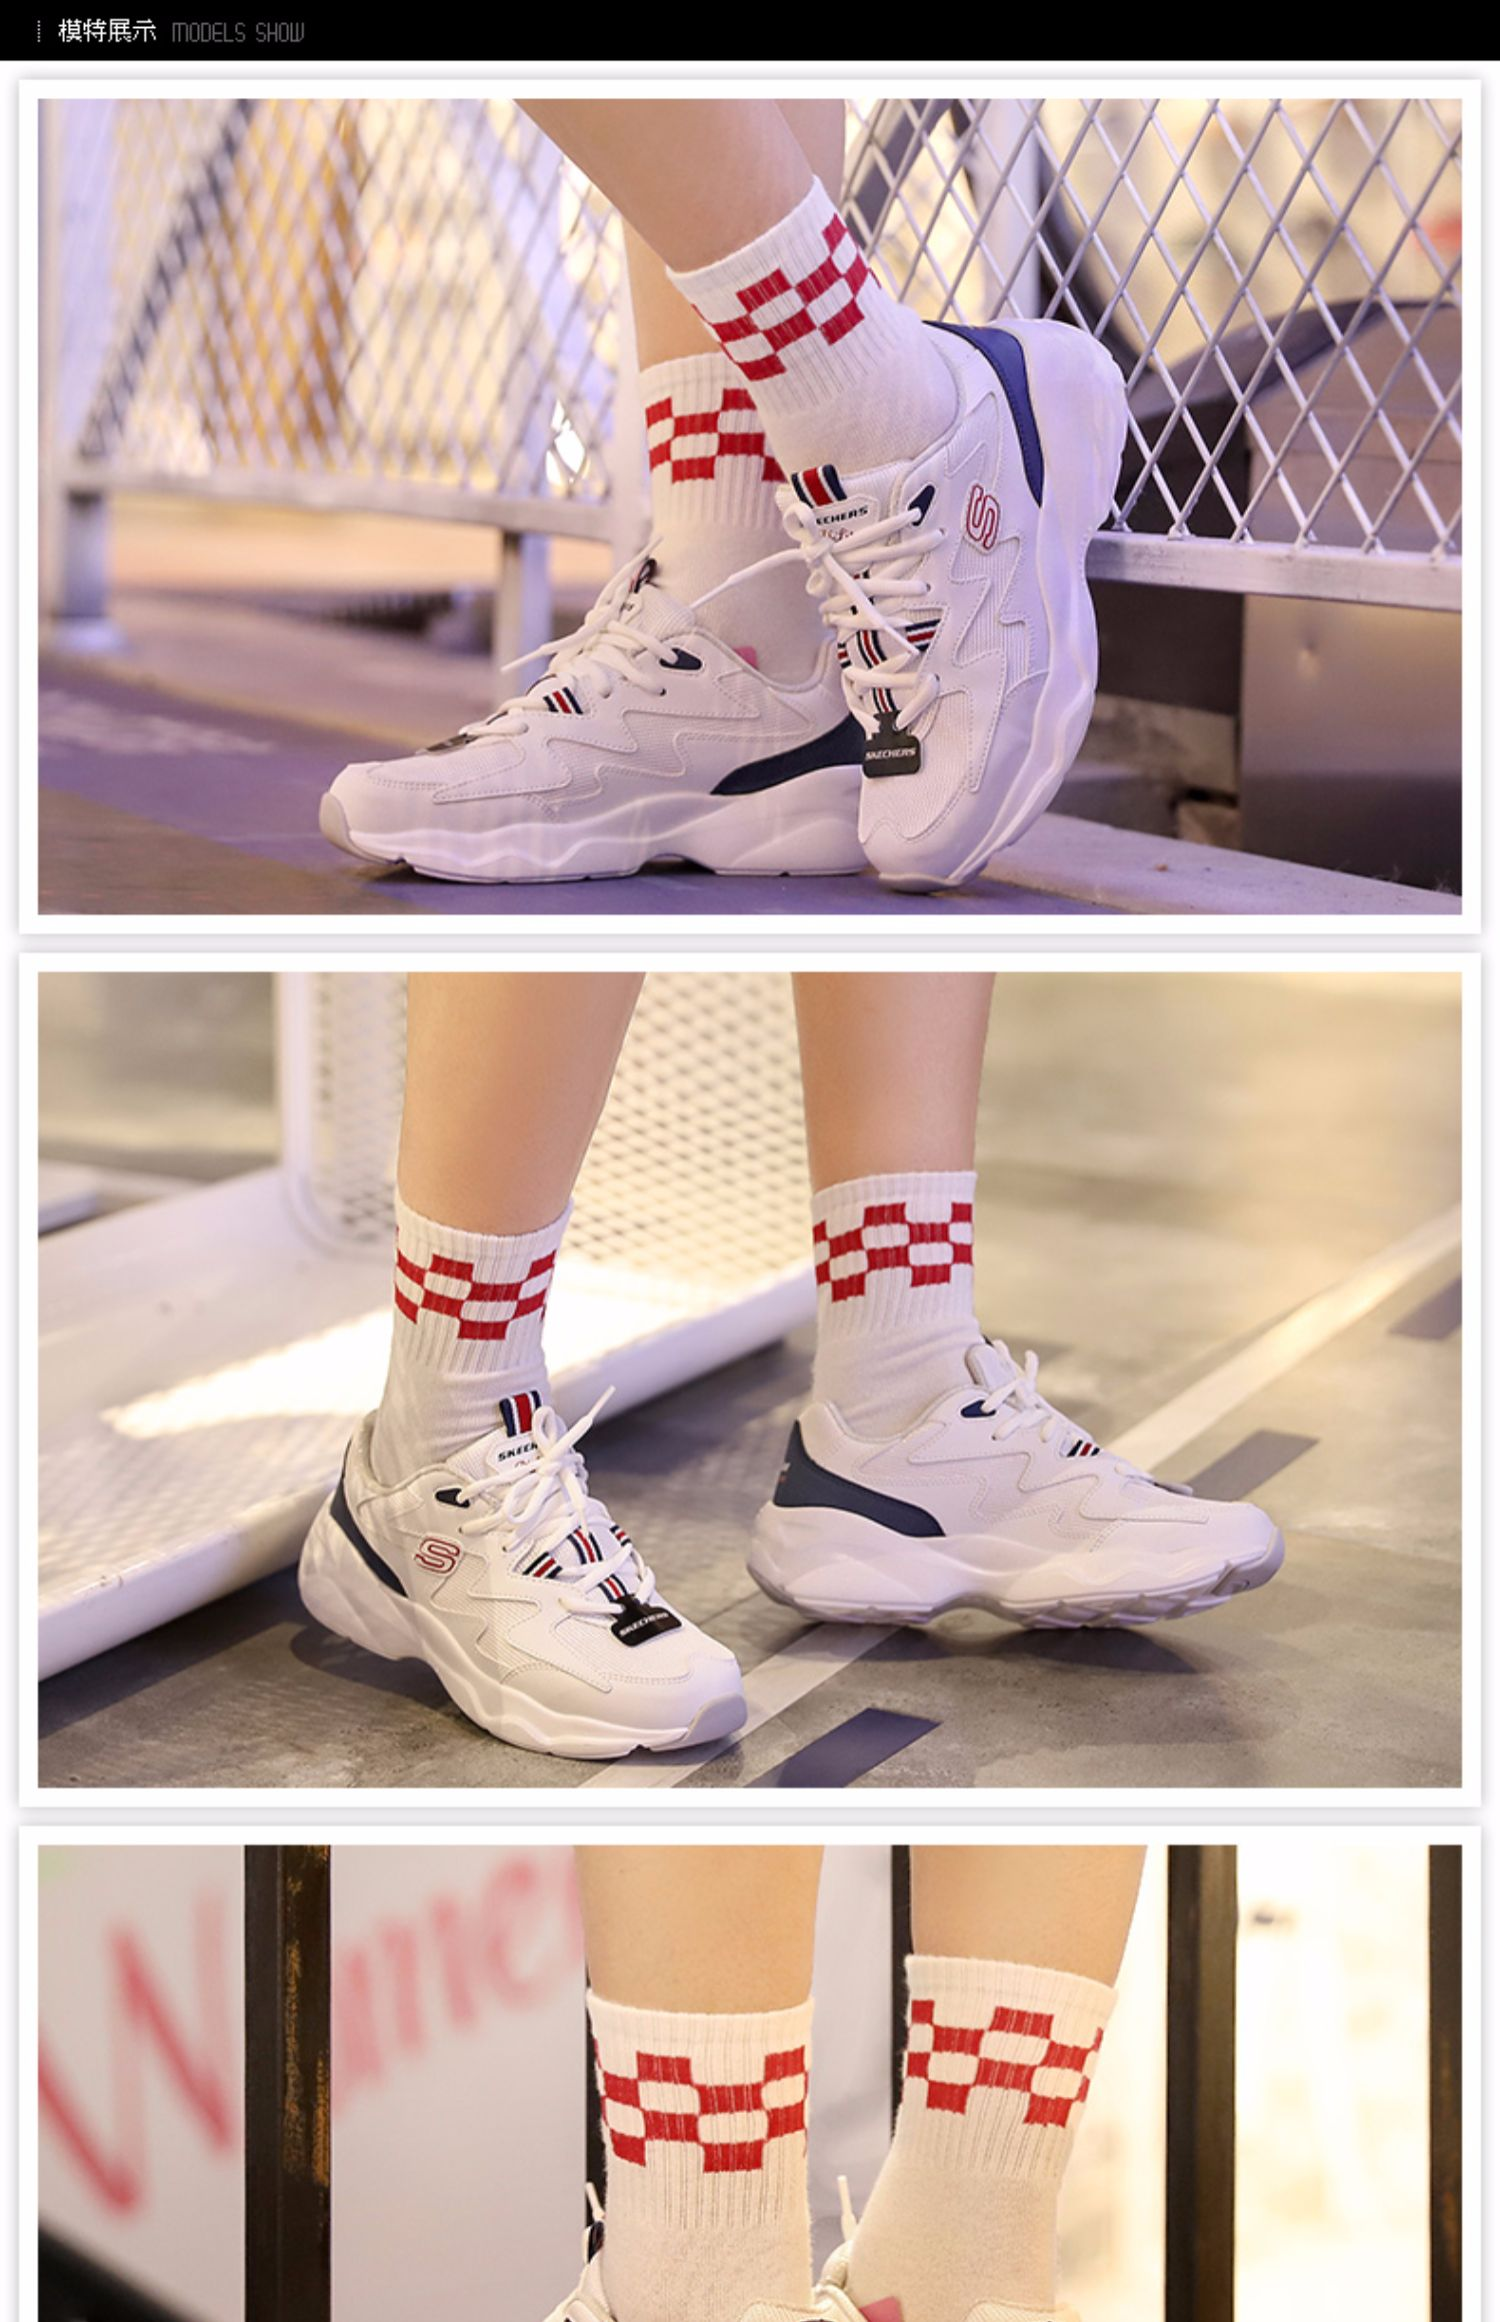 Skechers斯凯奇官网旗舰夏季新款女鞋厚底学生校园风熊猫鞋跑步鞋商品详情图